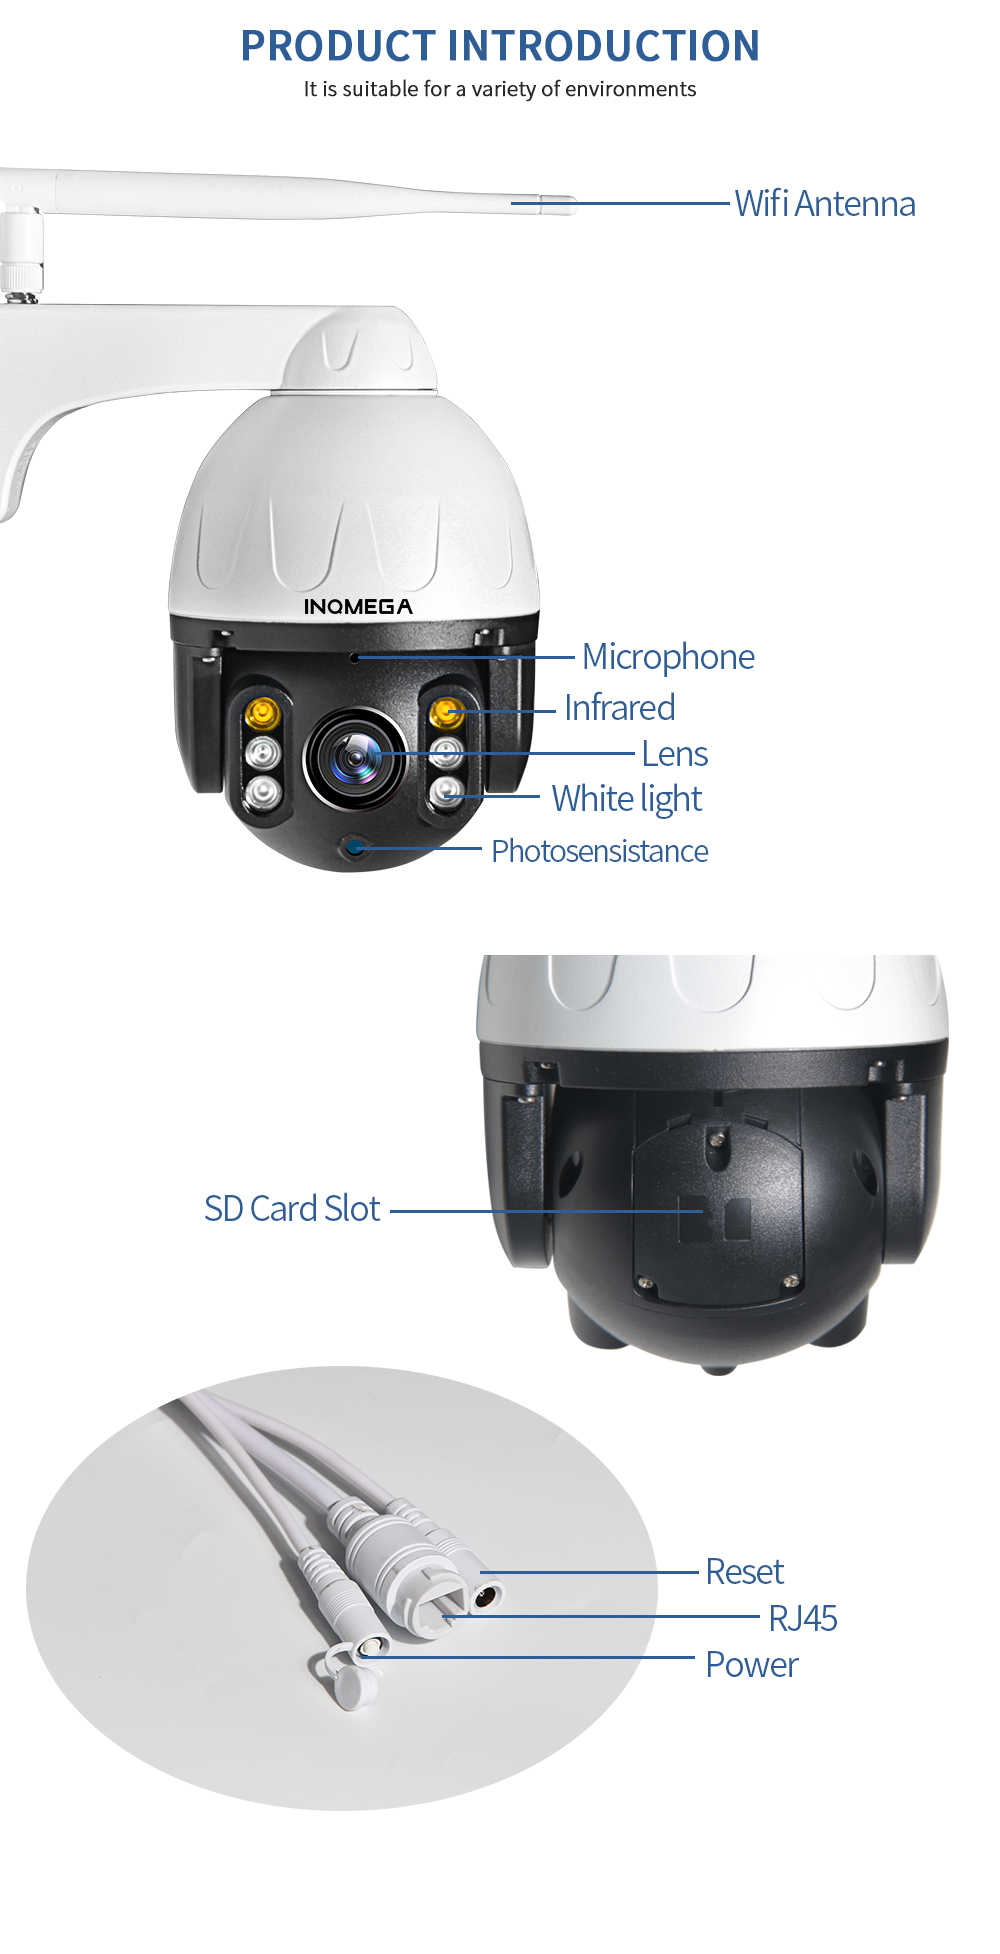 H30d412fb4980440288a2a83ddfe2d1c8I INQMEGA Cloud 1080P Outdoor PTZ IP Camera WIFI Speed Dome Auto Tracking Camera 4X Digital Zoom 2MP Onvif IR CCTV Security Camera